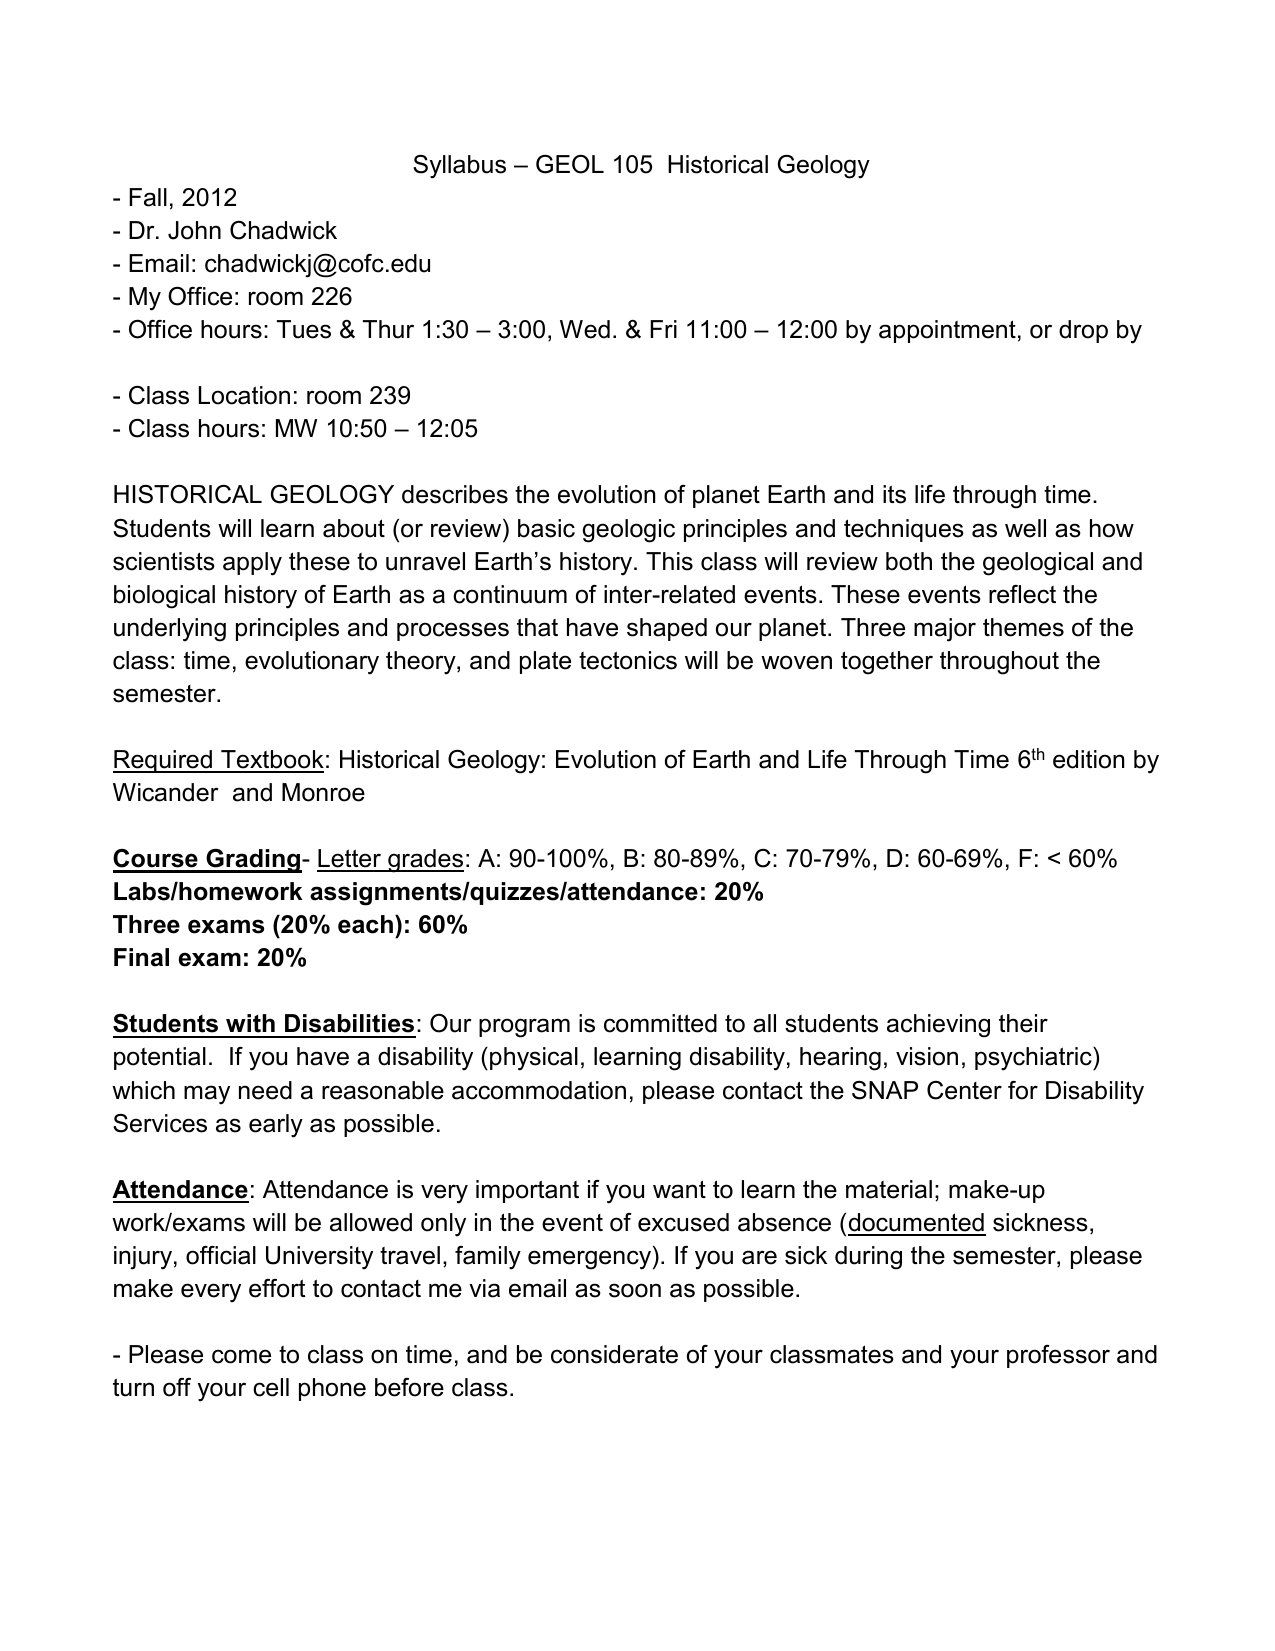 9th grade expository essay rubric